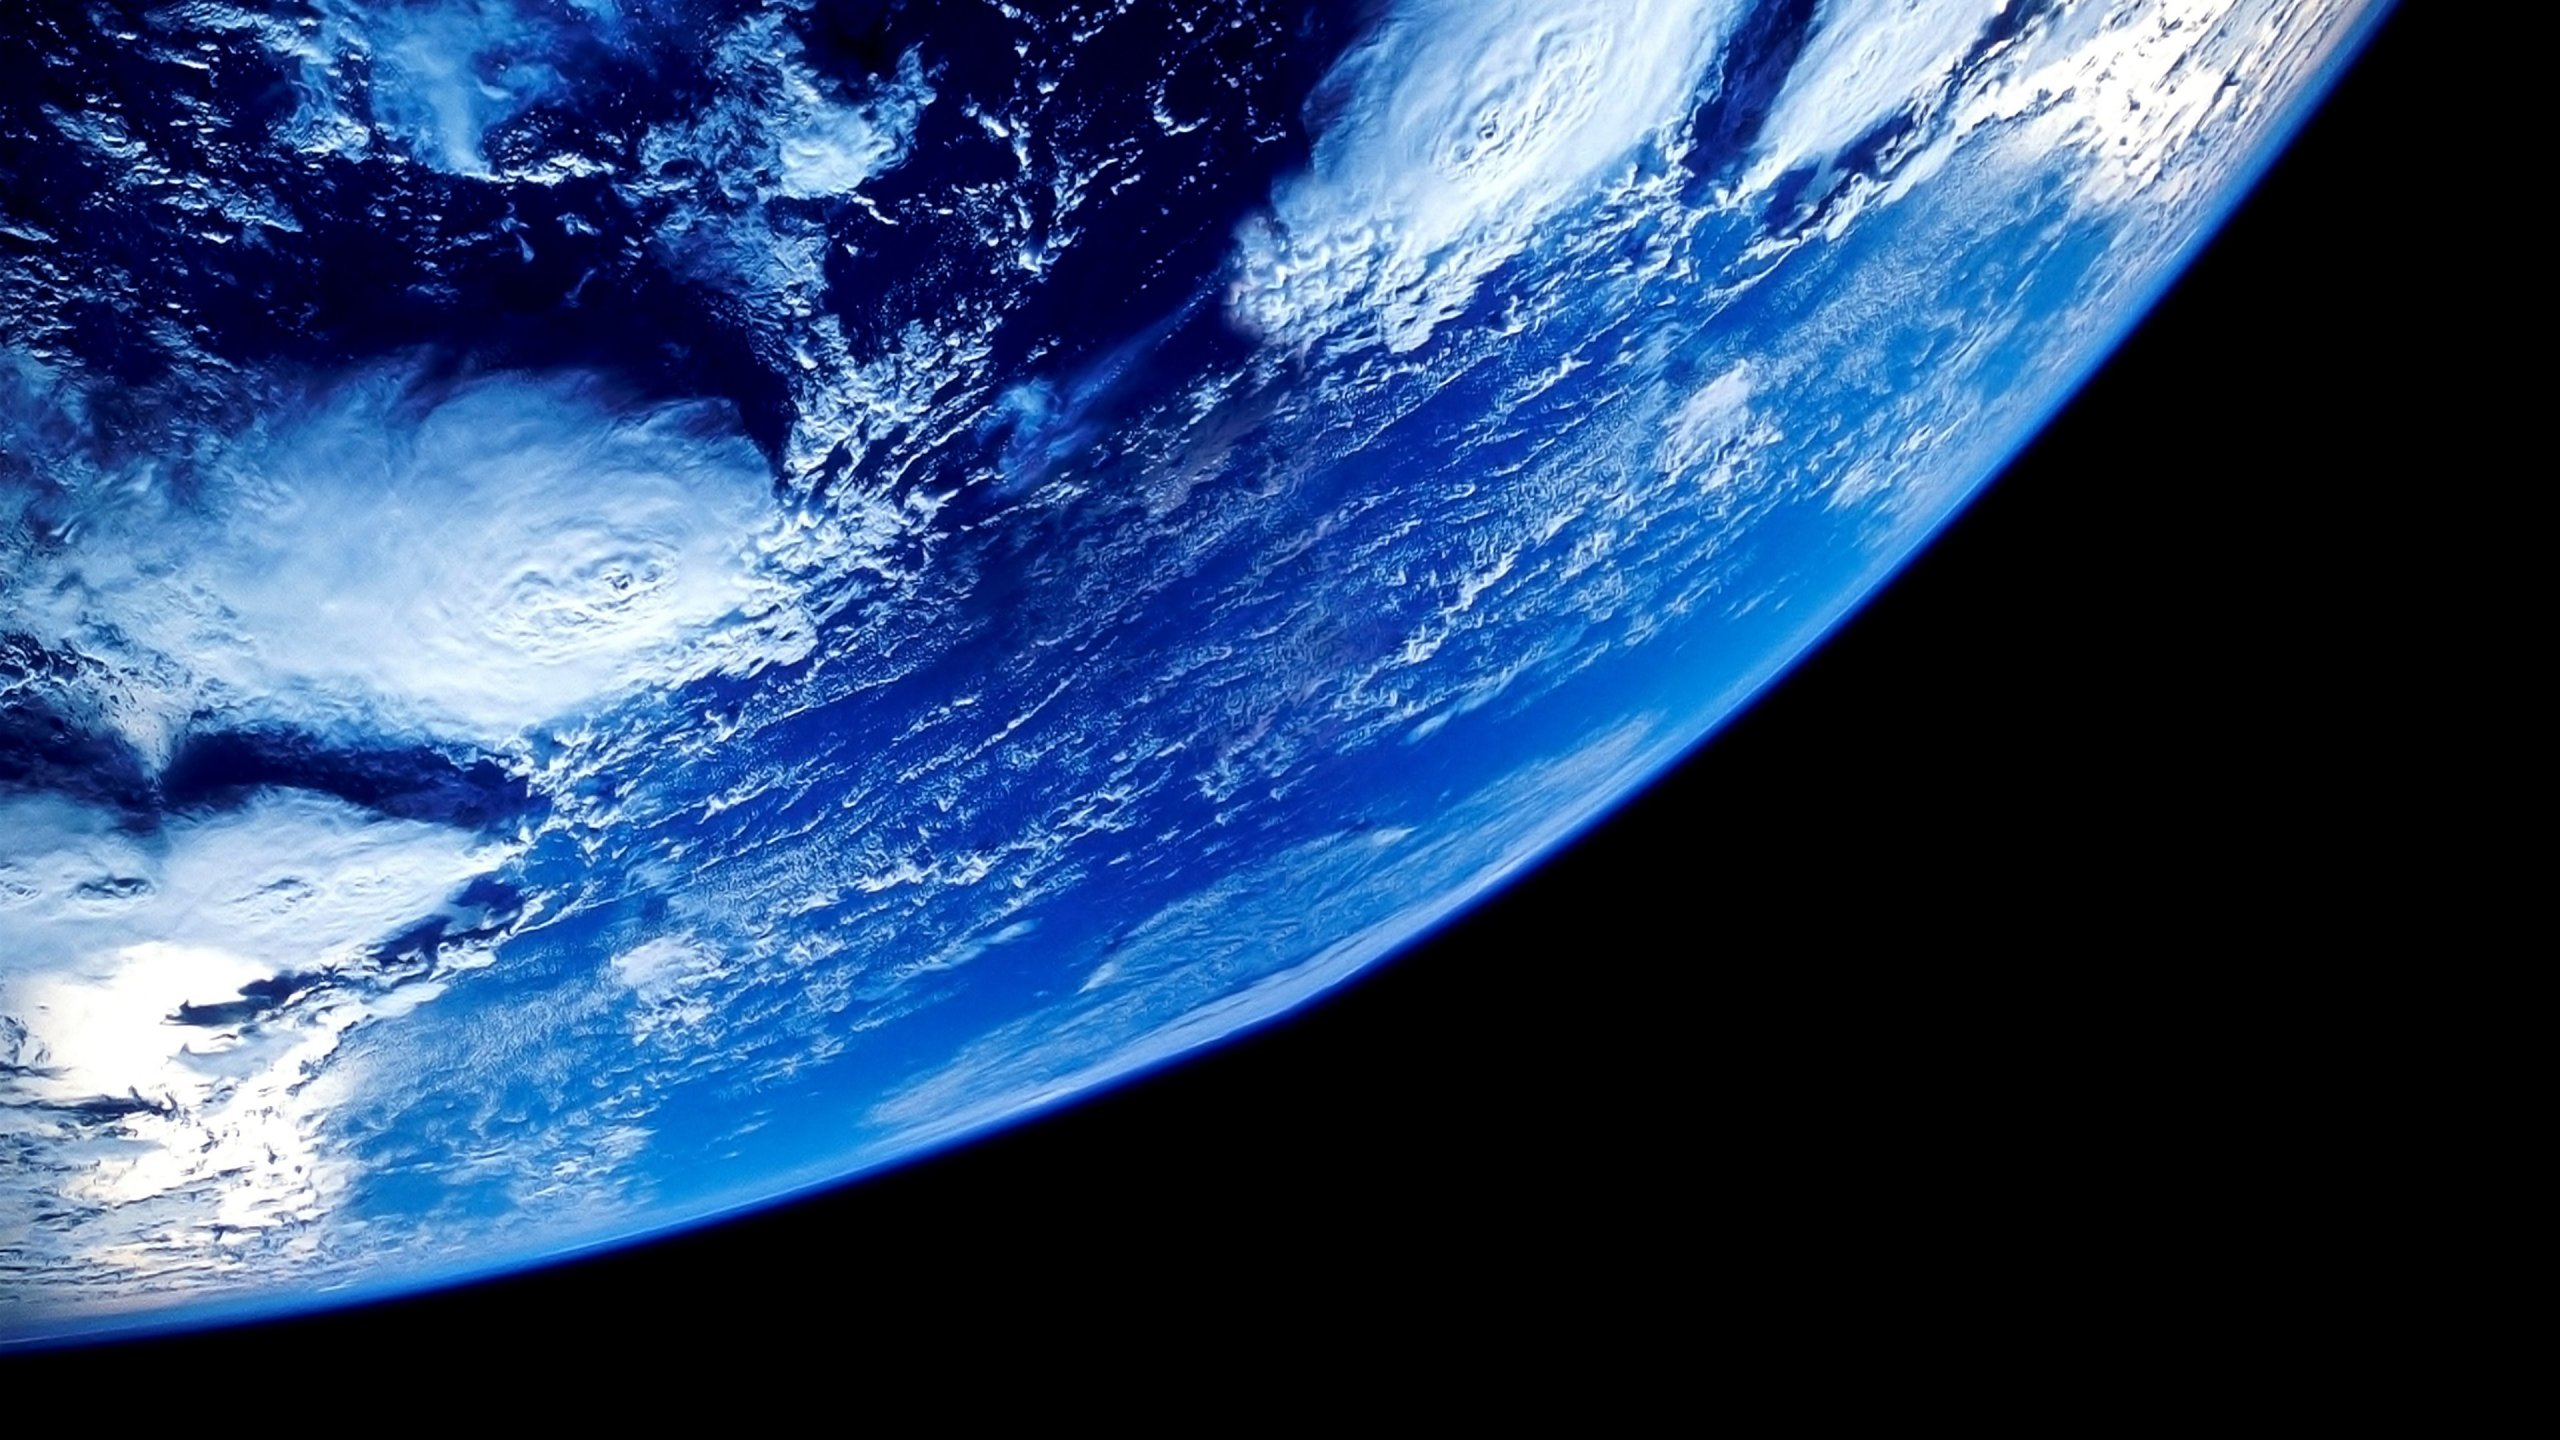 Earth From Space Wallpaper 4k Ultra Hd Id2981